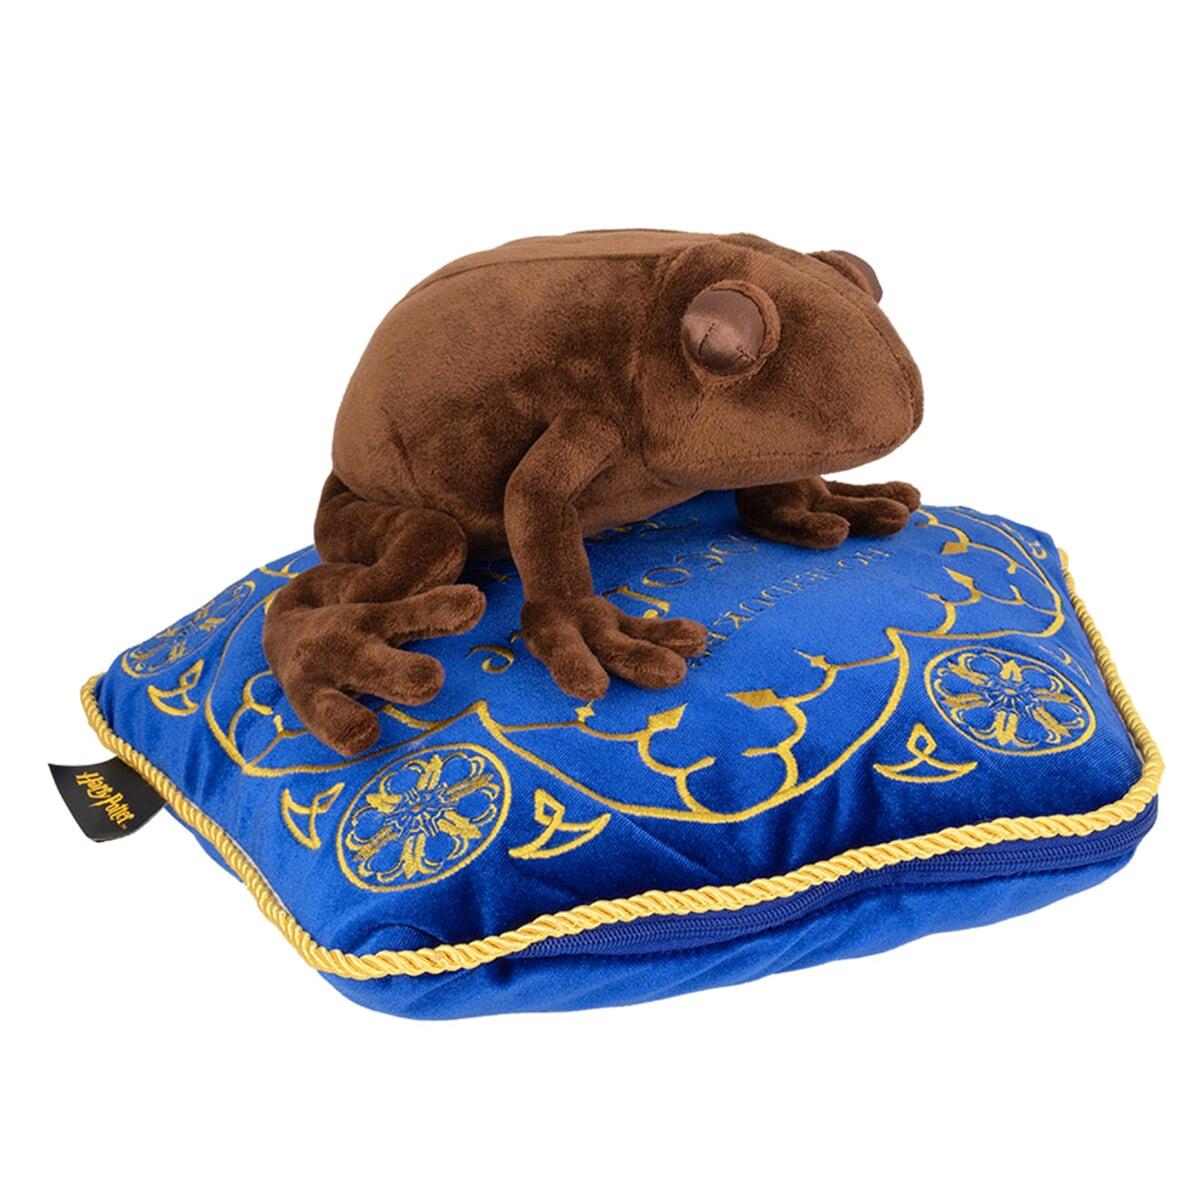 Мягкая игрушка Harry Potter: Chocolate Frog